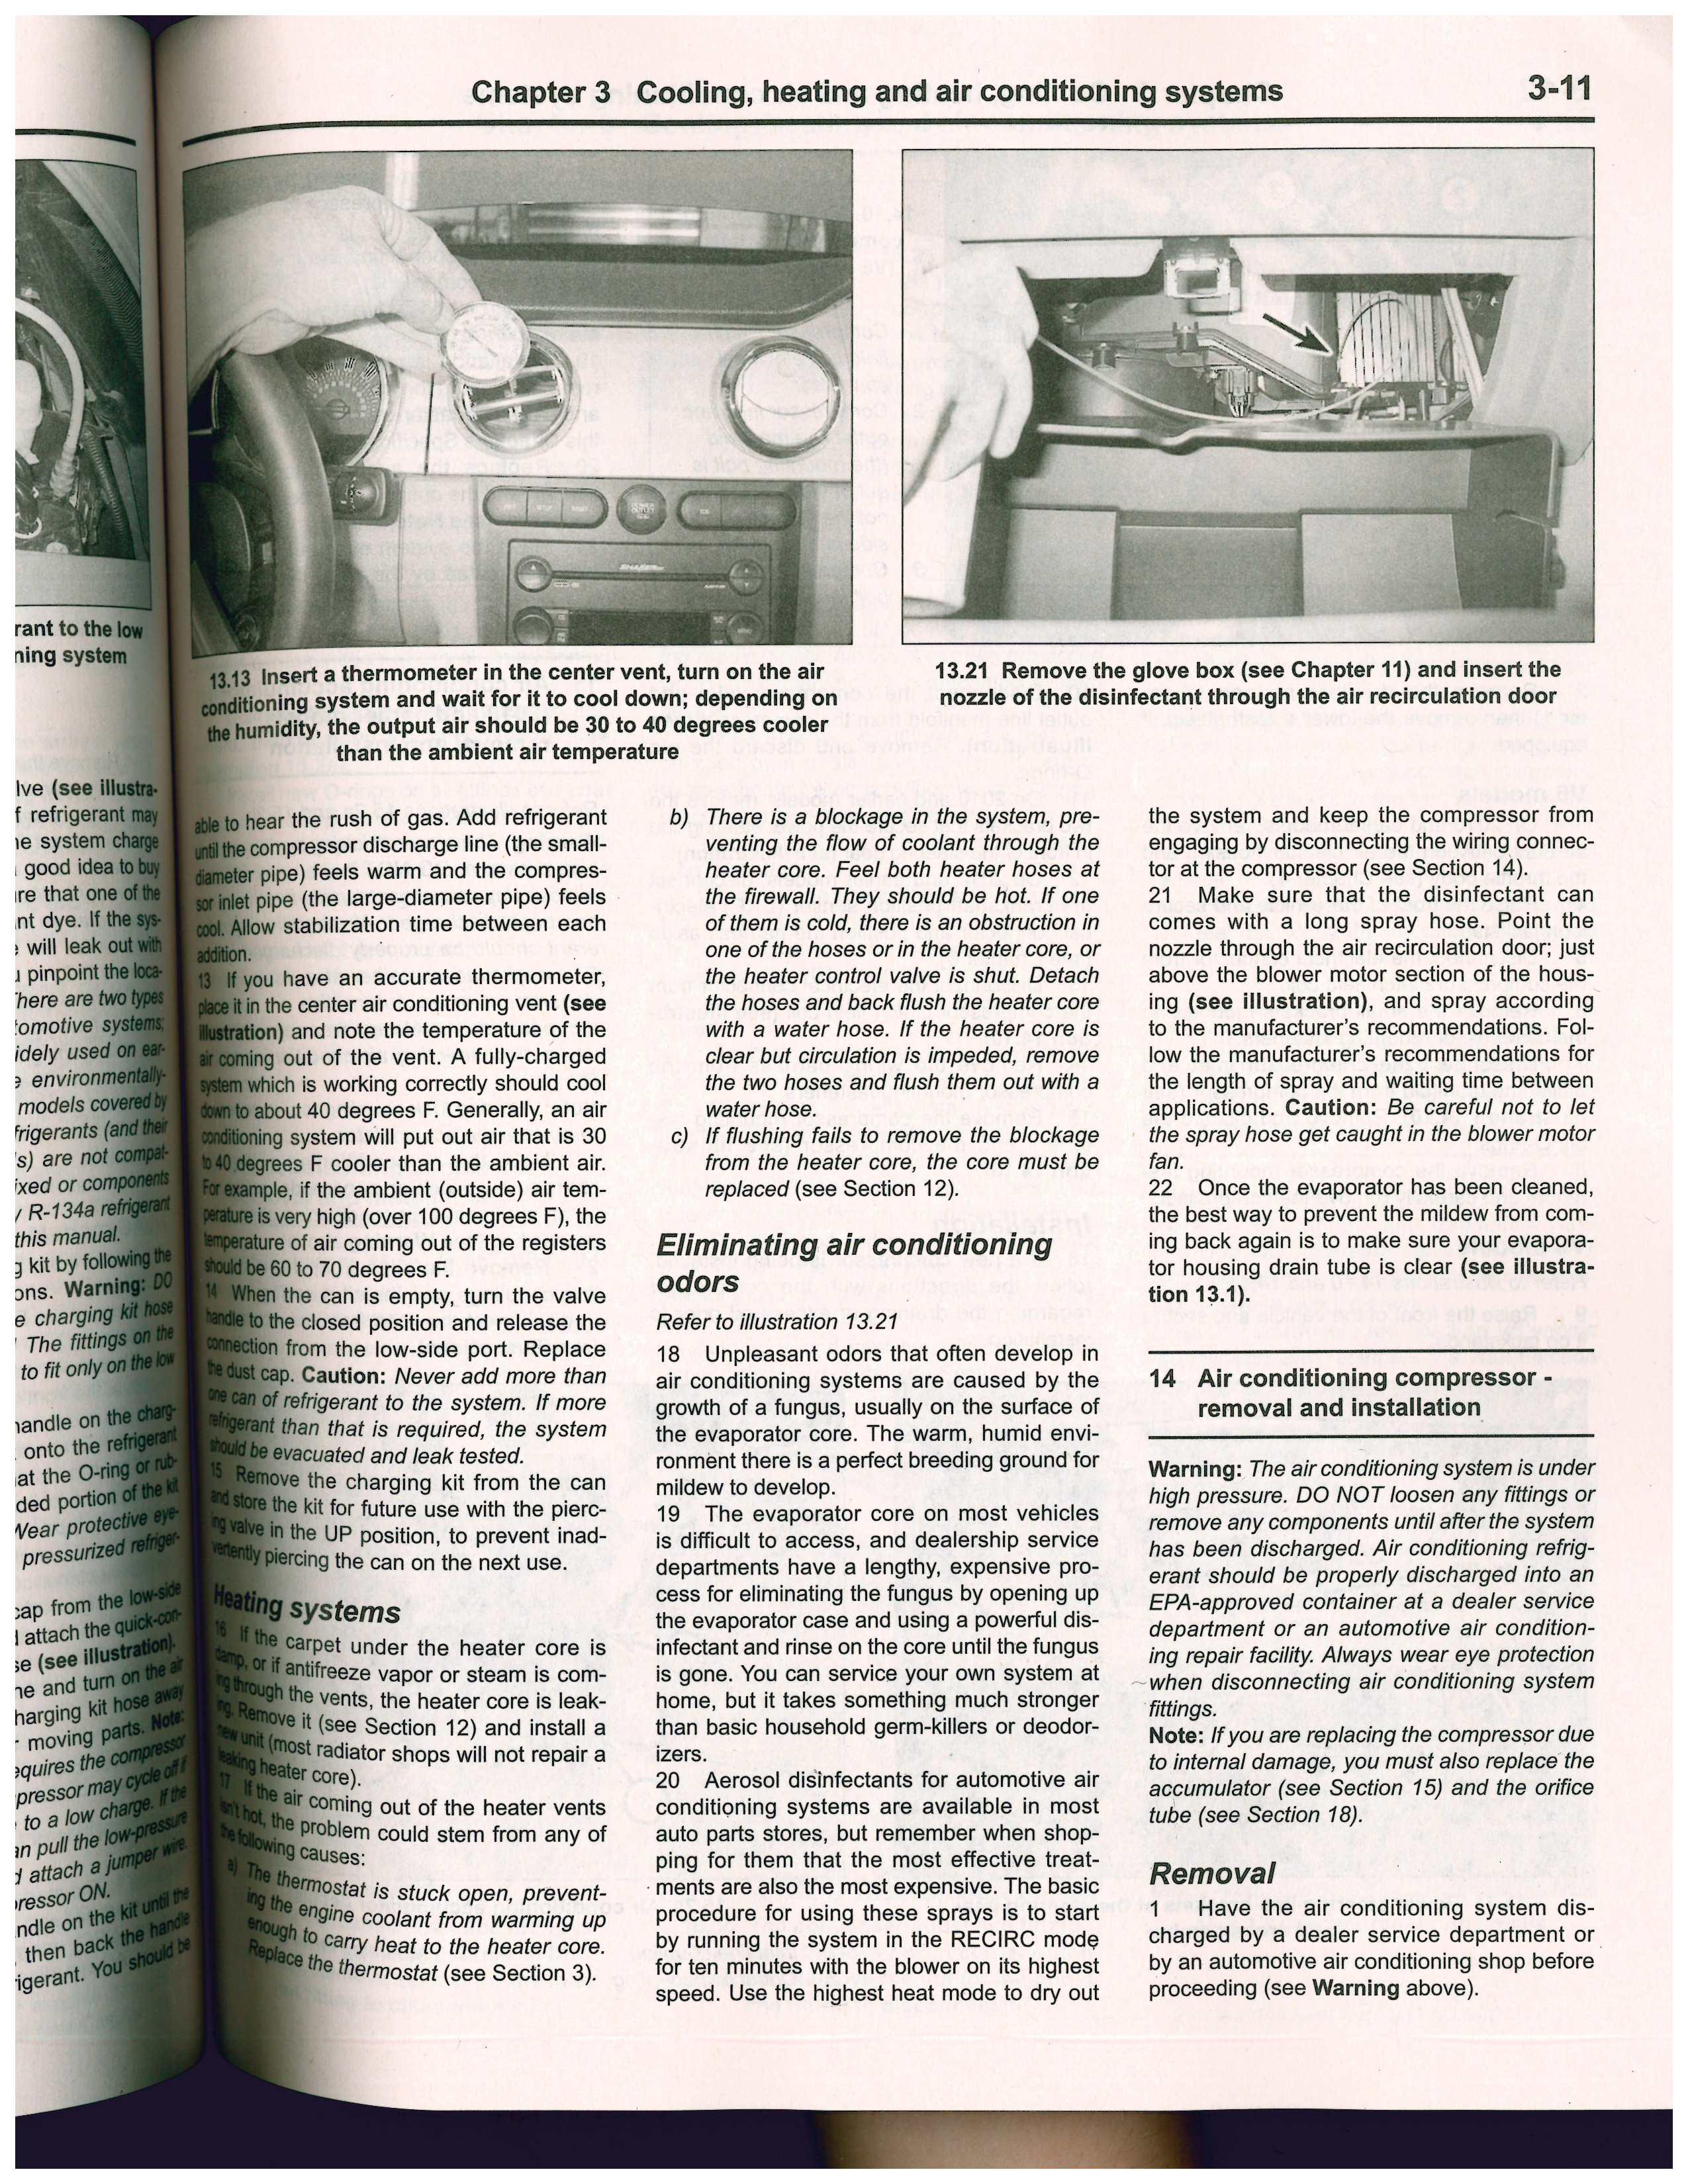 2005 Ford Mustang Wiring Diagram Manual Original 2005 Ford Mustang